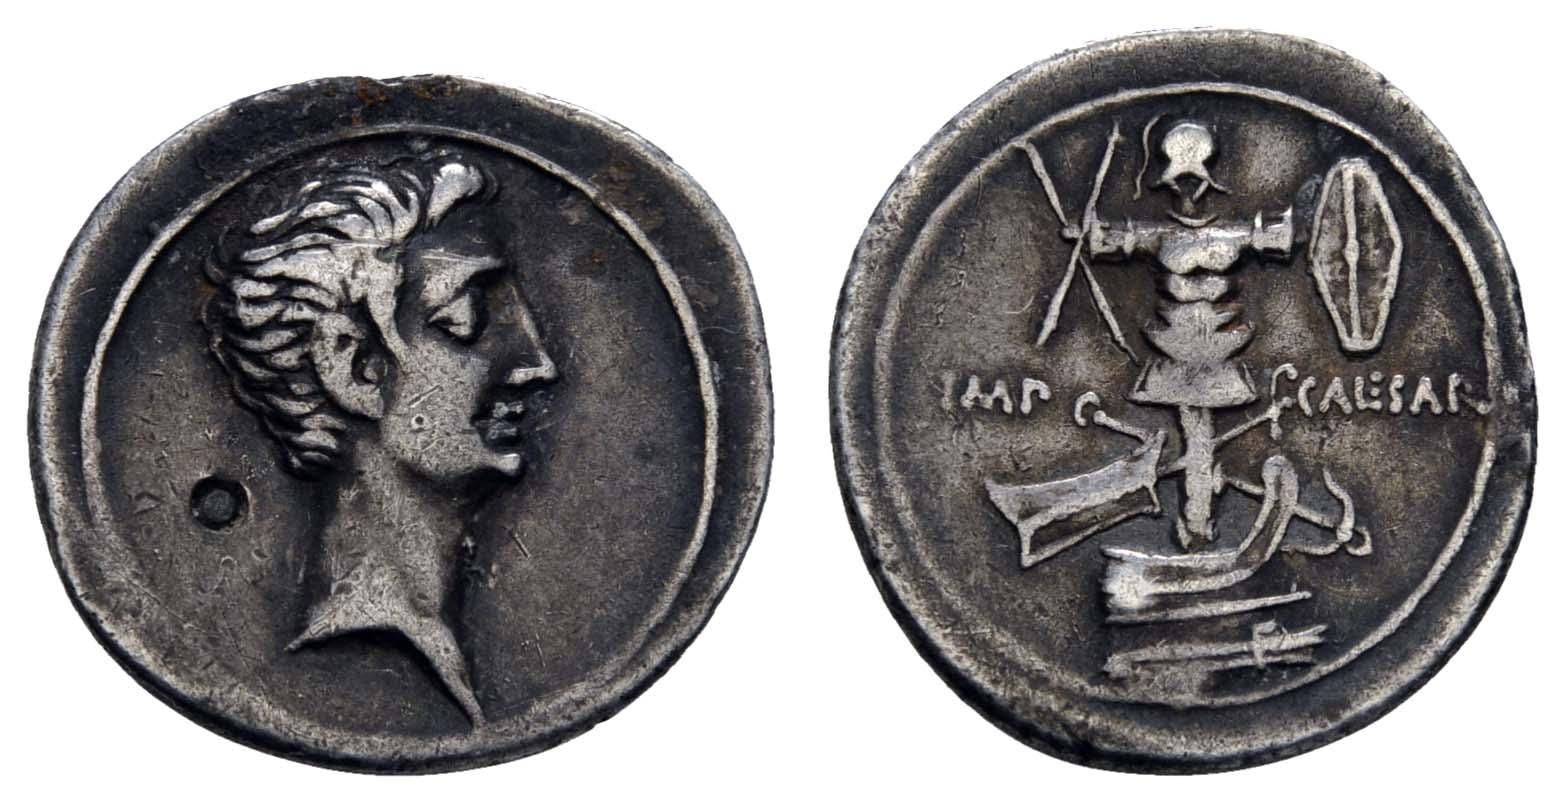 Lot 114 - Antike Römer - Republik -  Auktionshaus Ulrich Felzmann GmbH & Co. KG Coins single lots